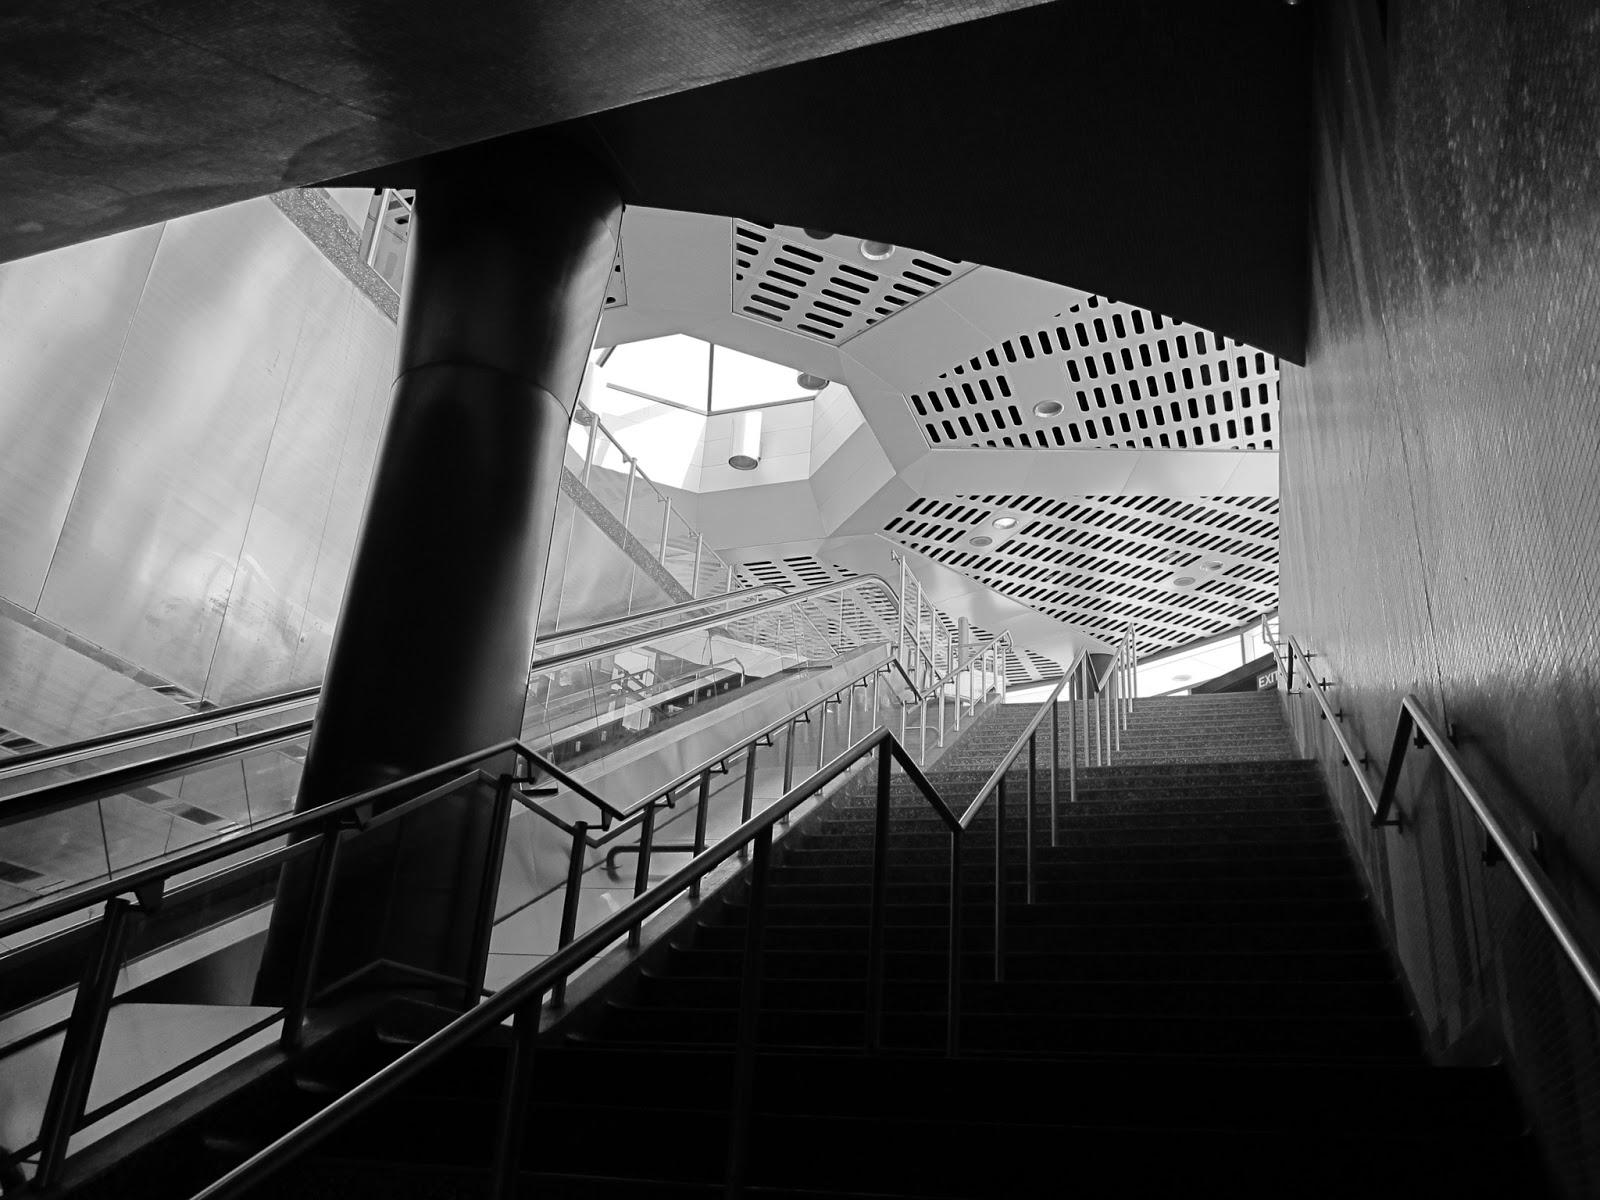 Photo: Stairwell to passenger pickup, Downsview station, Toronto